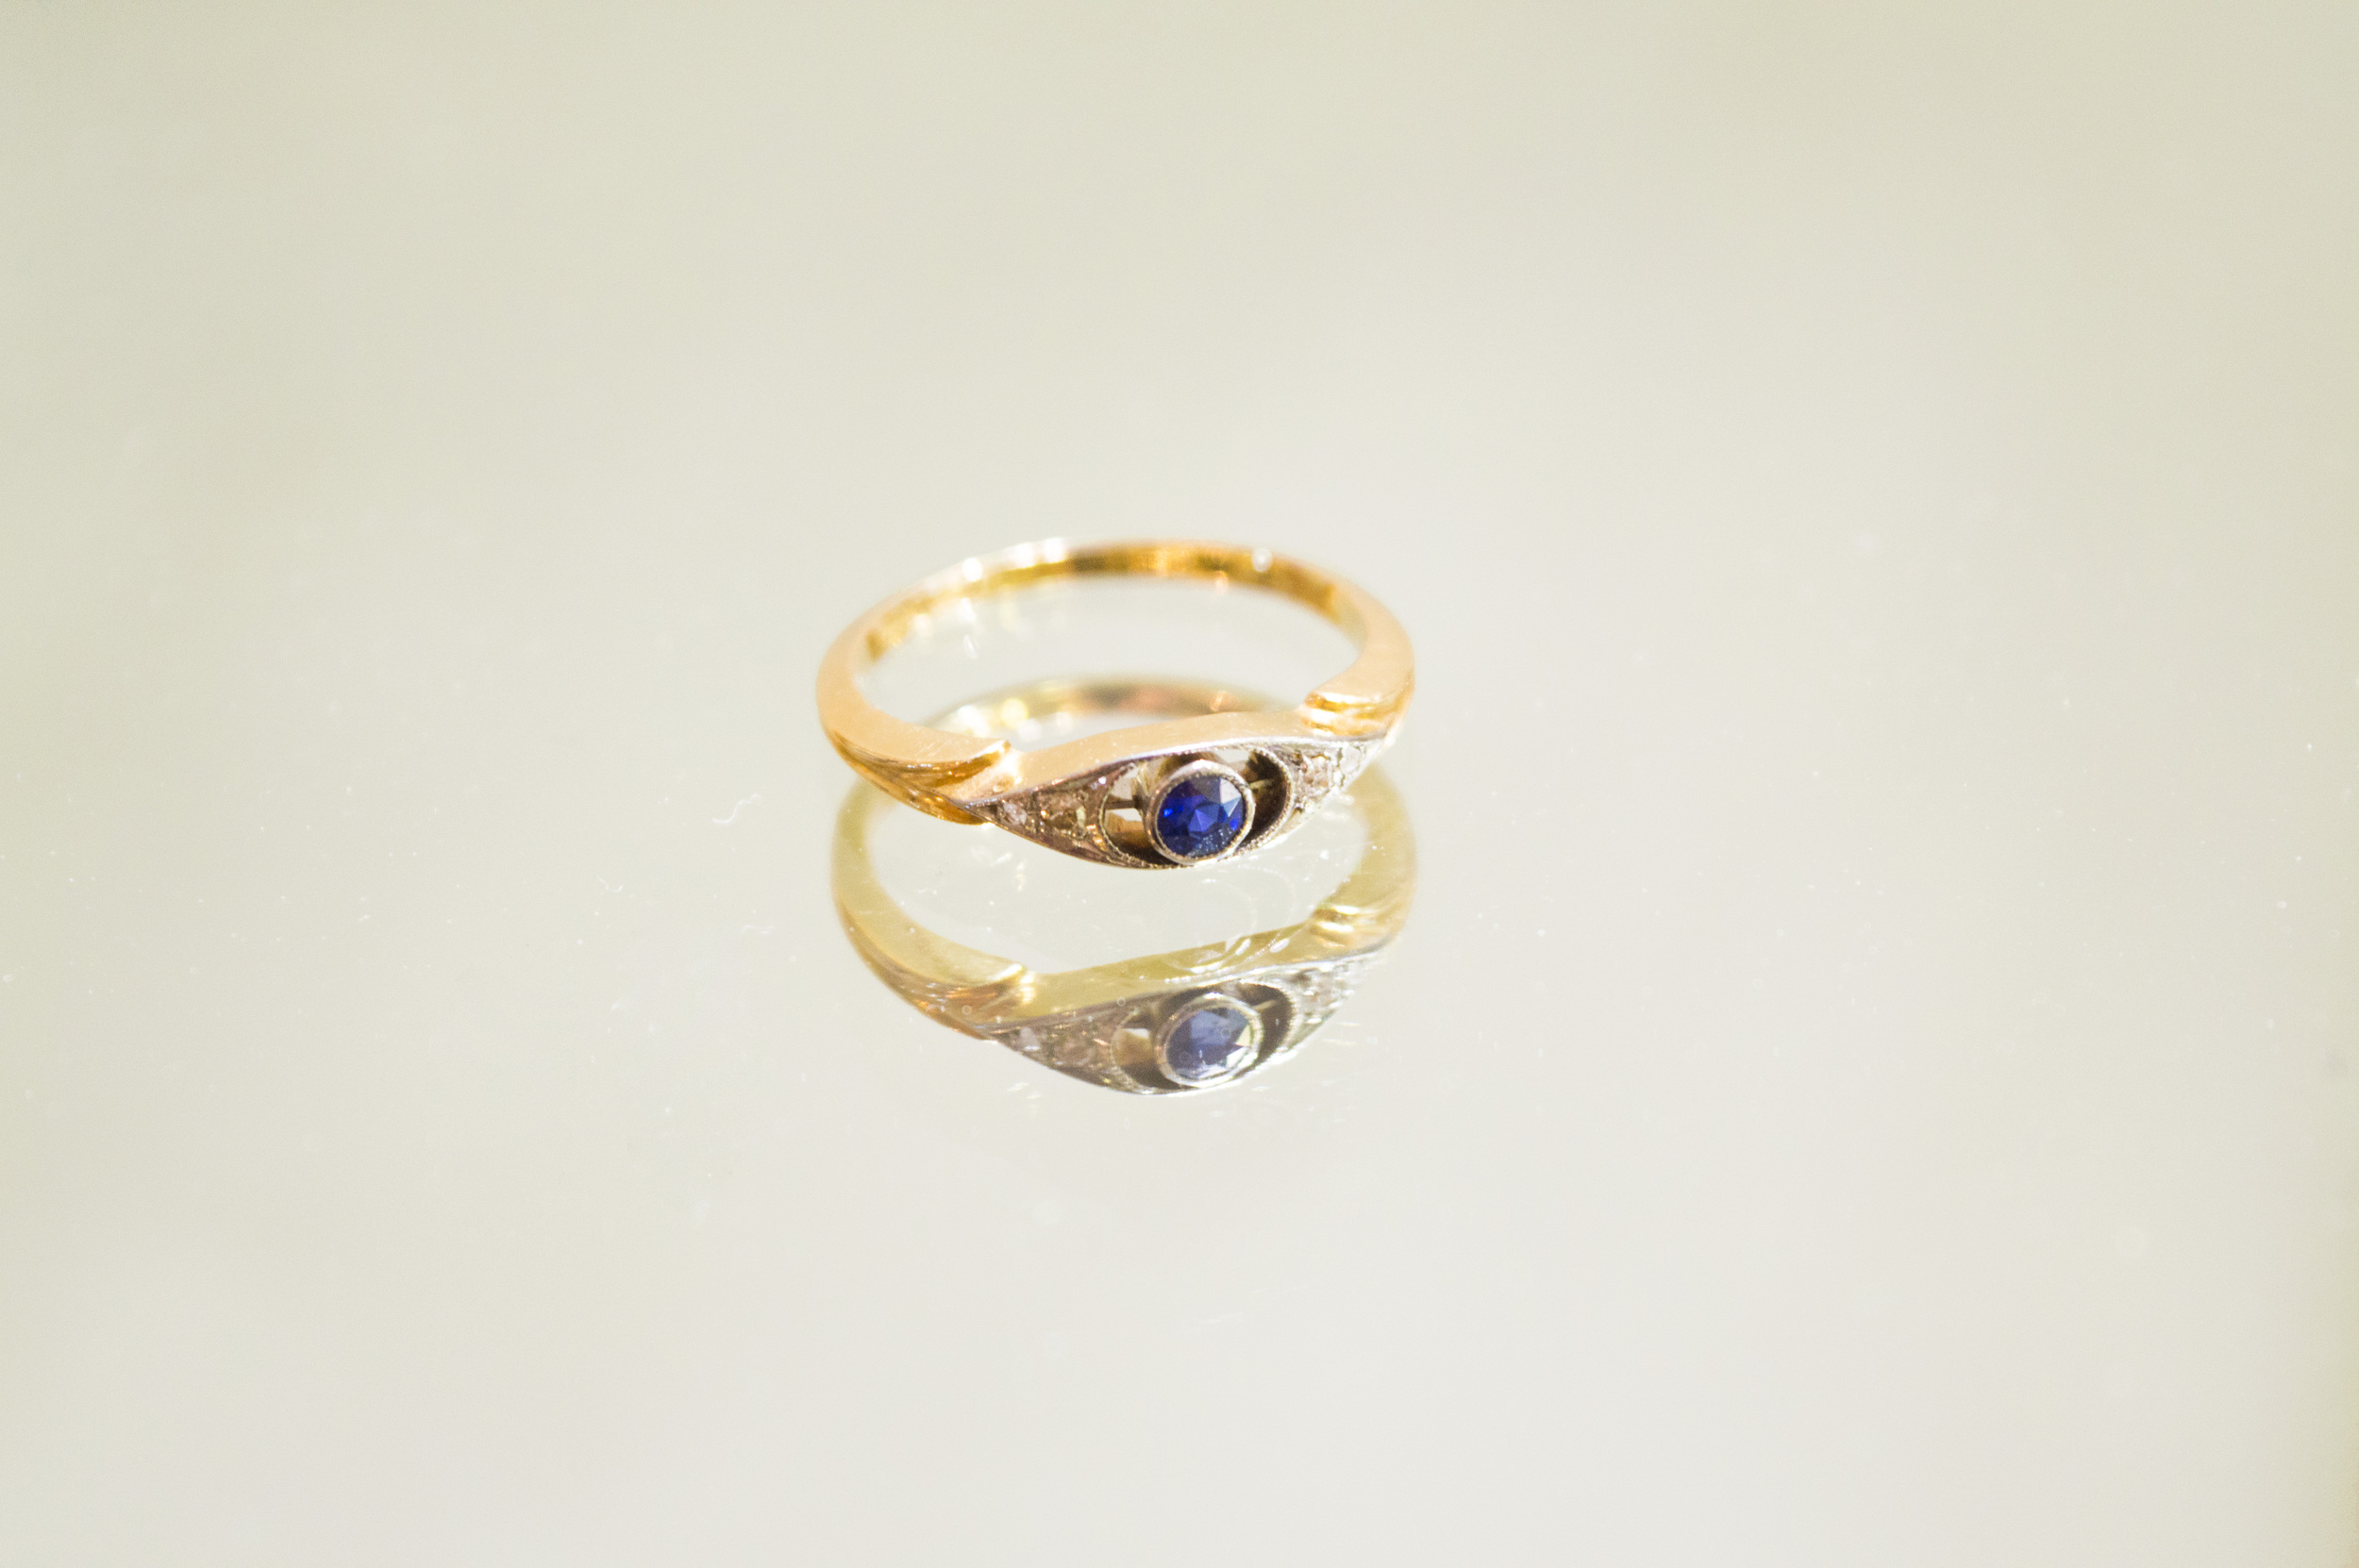 £185 - 9ct Diamond & Sapphire Ring